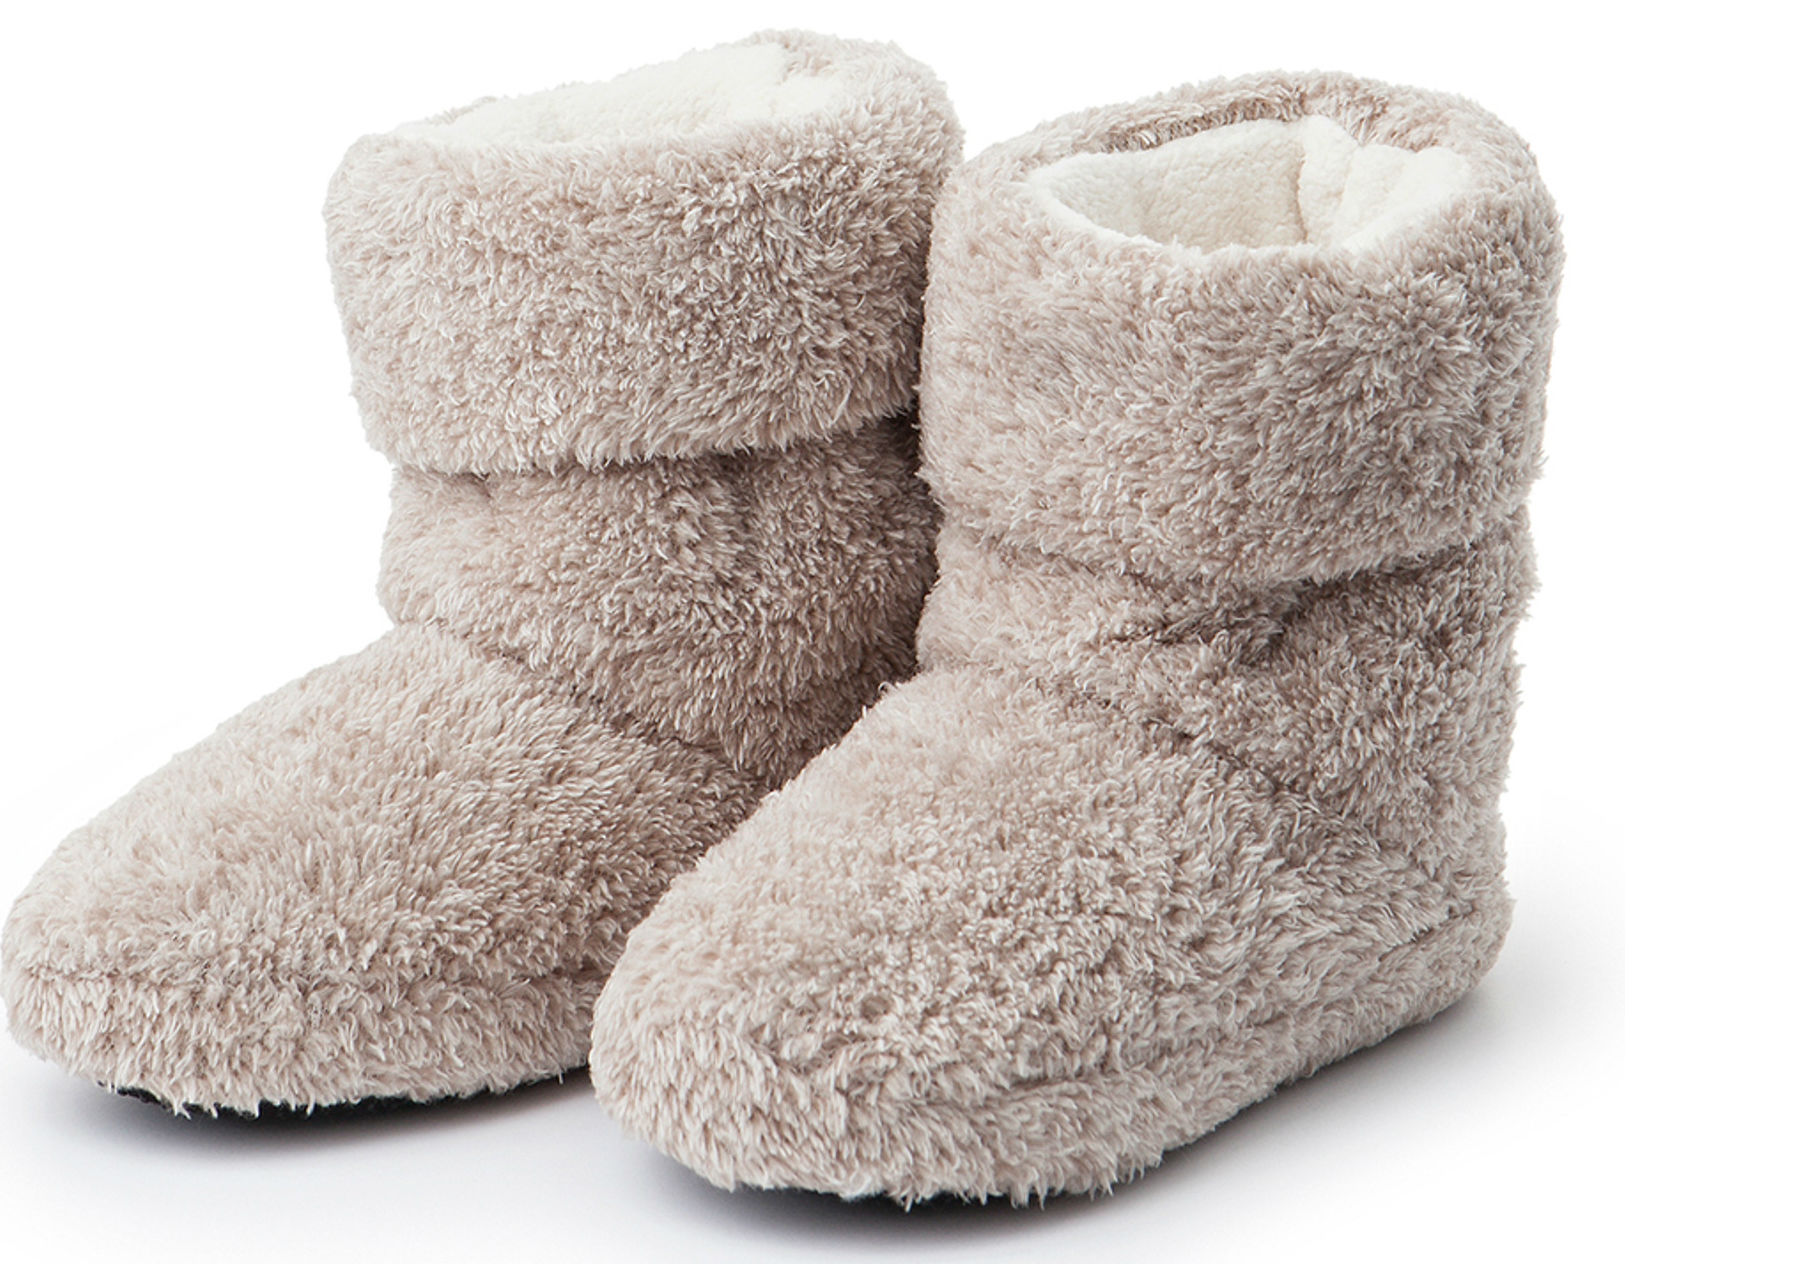 sutsko, hyggetøj, nattøj, hygge, jul, december, afslapning, kulde, varme,